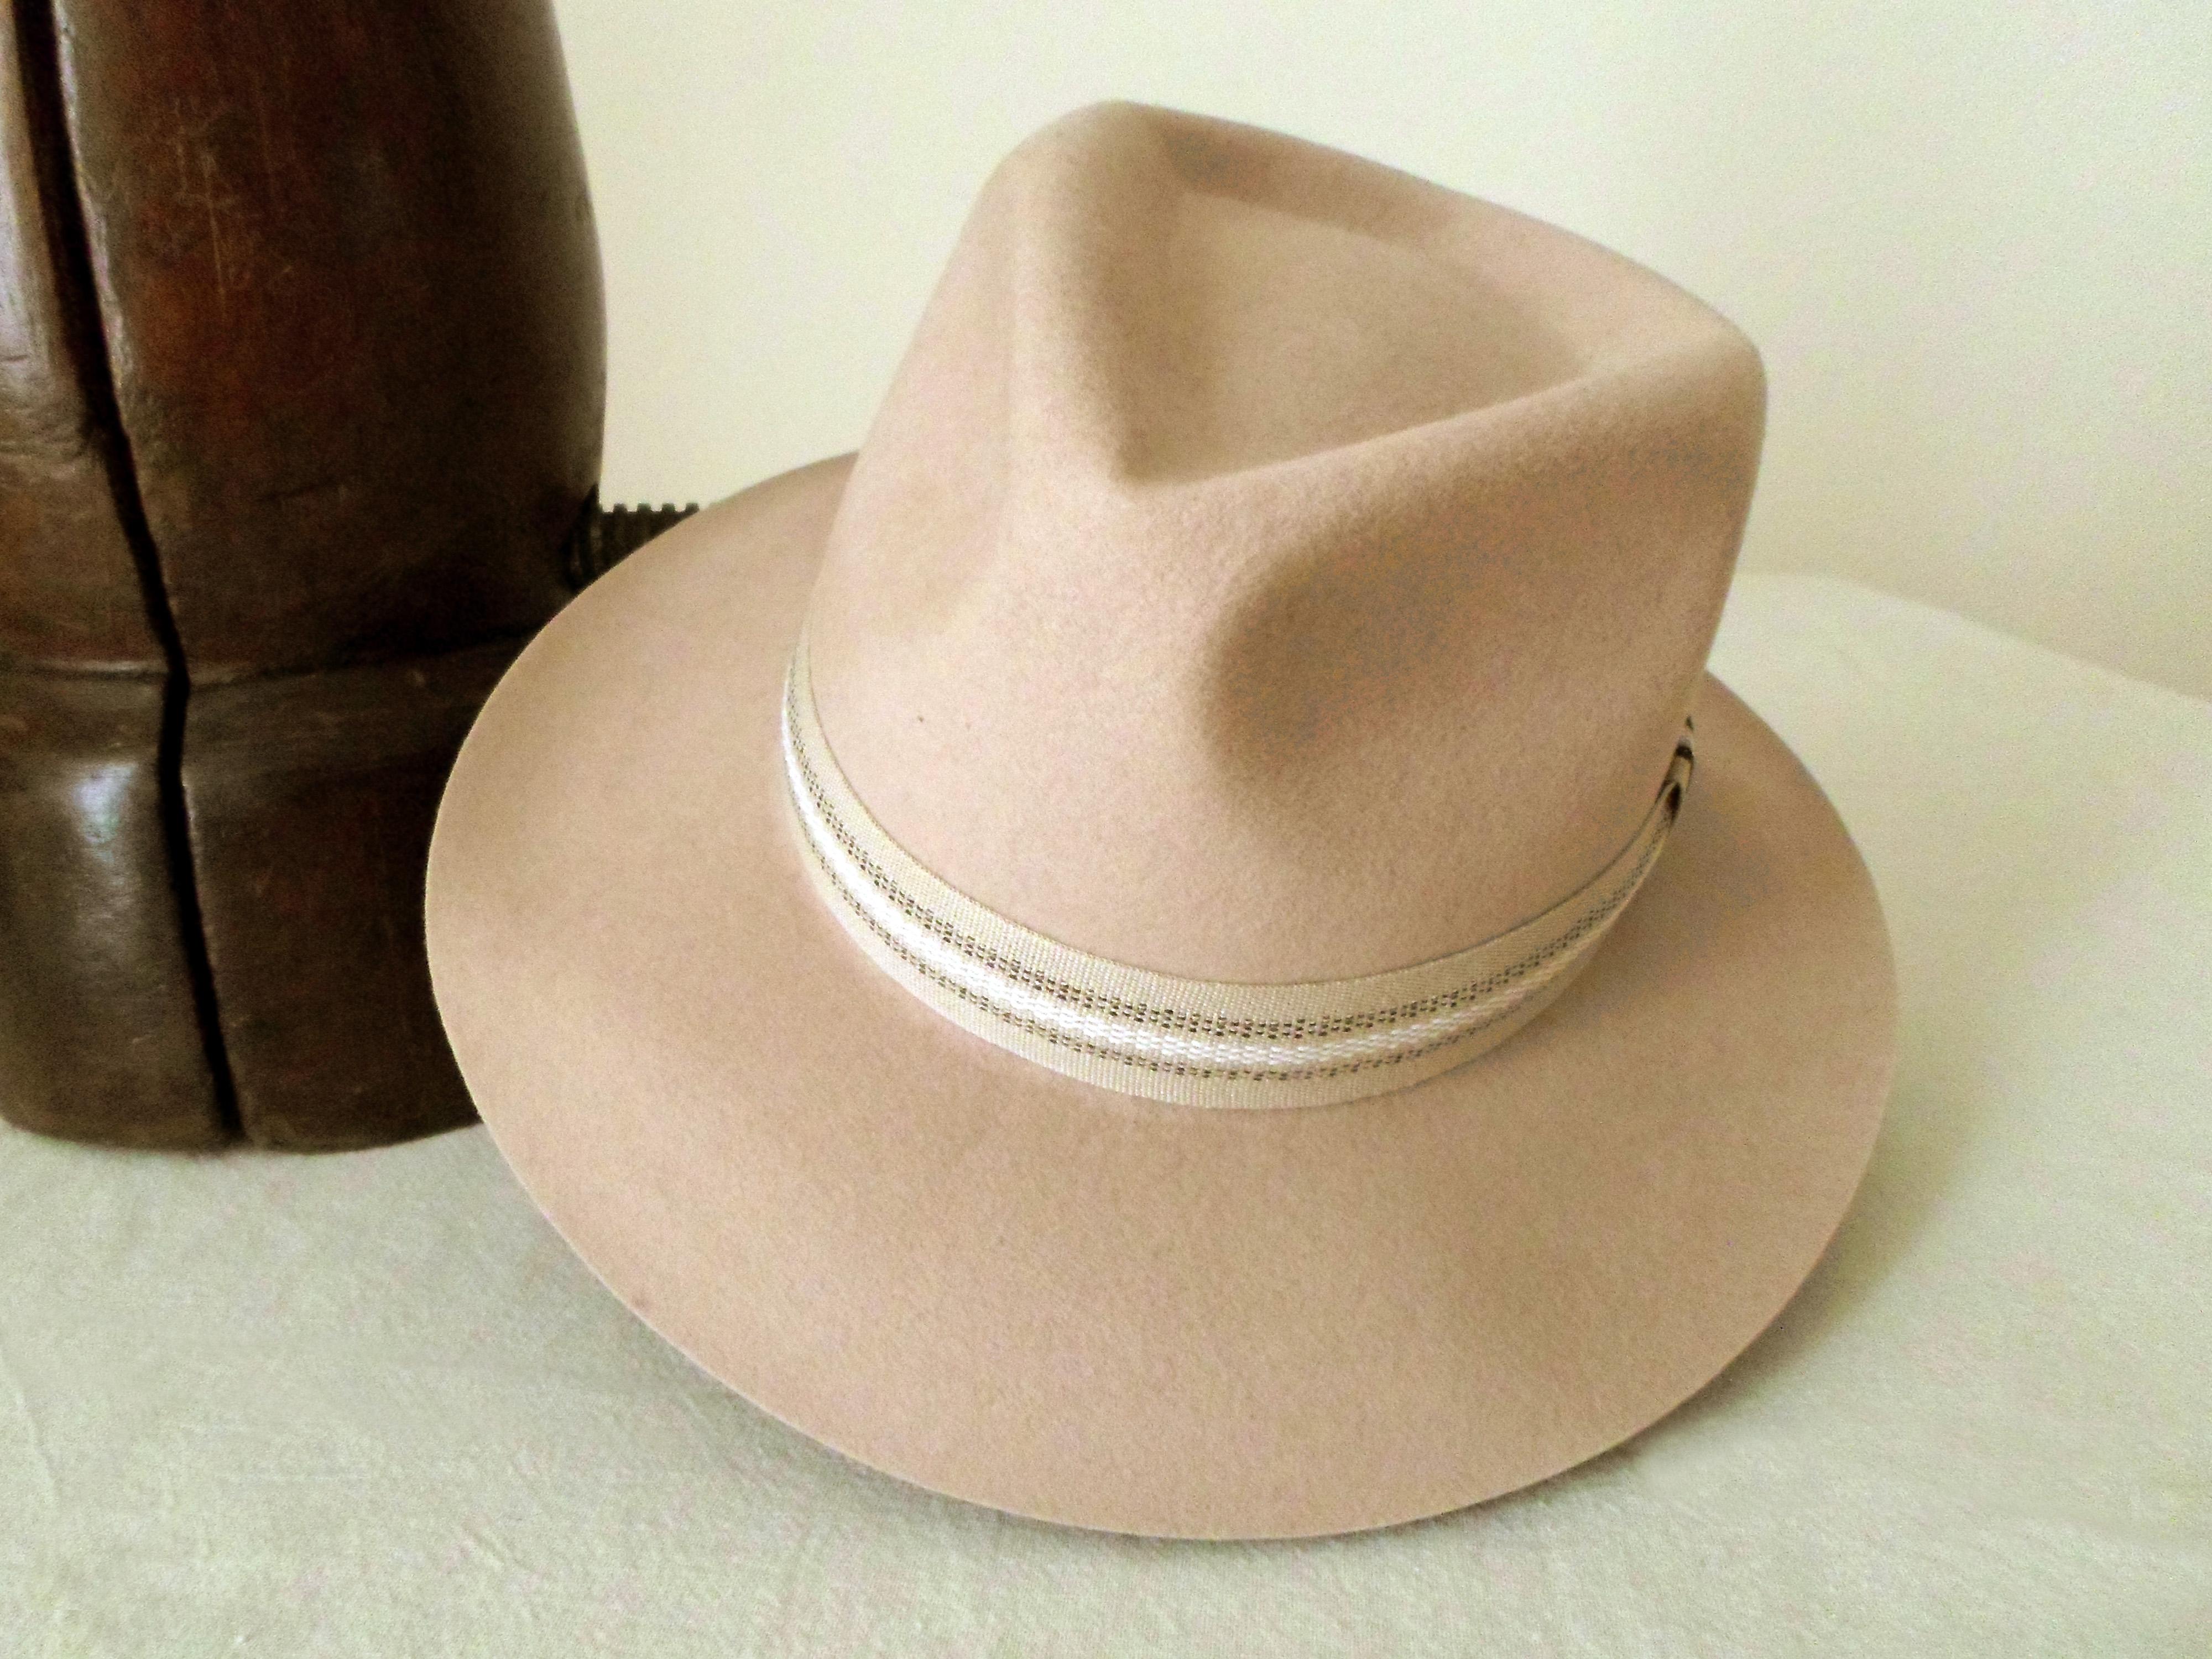 5a1ebd52f Beige Wool Felt Fedora - Wide Brim Merino Wool Felt Handmade Fedora Hat -  Men Women